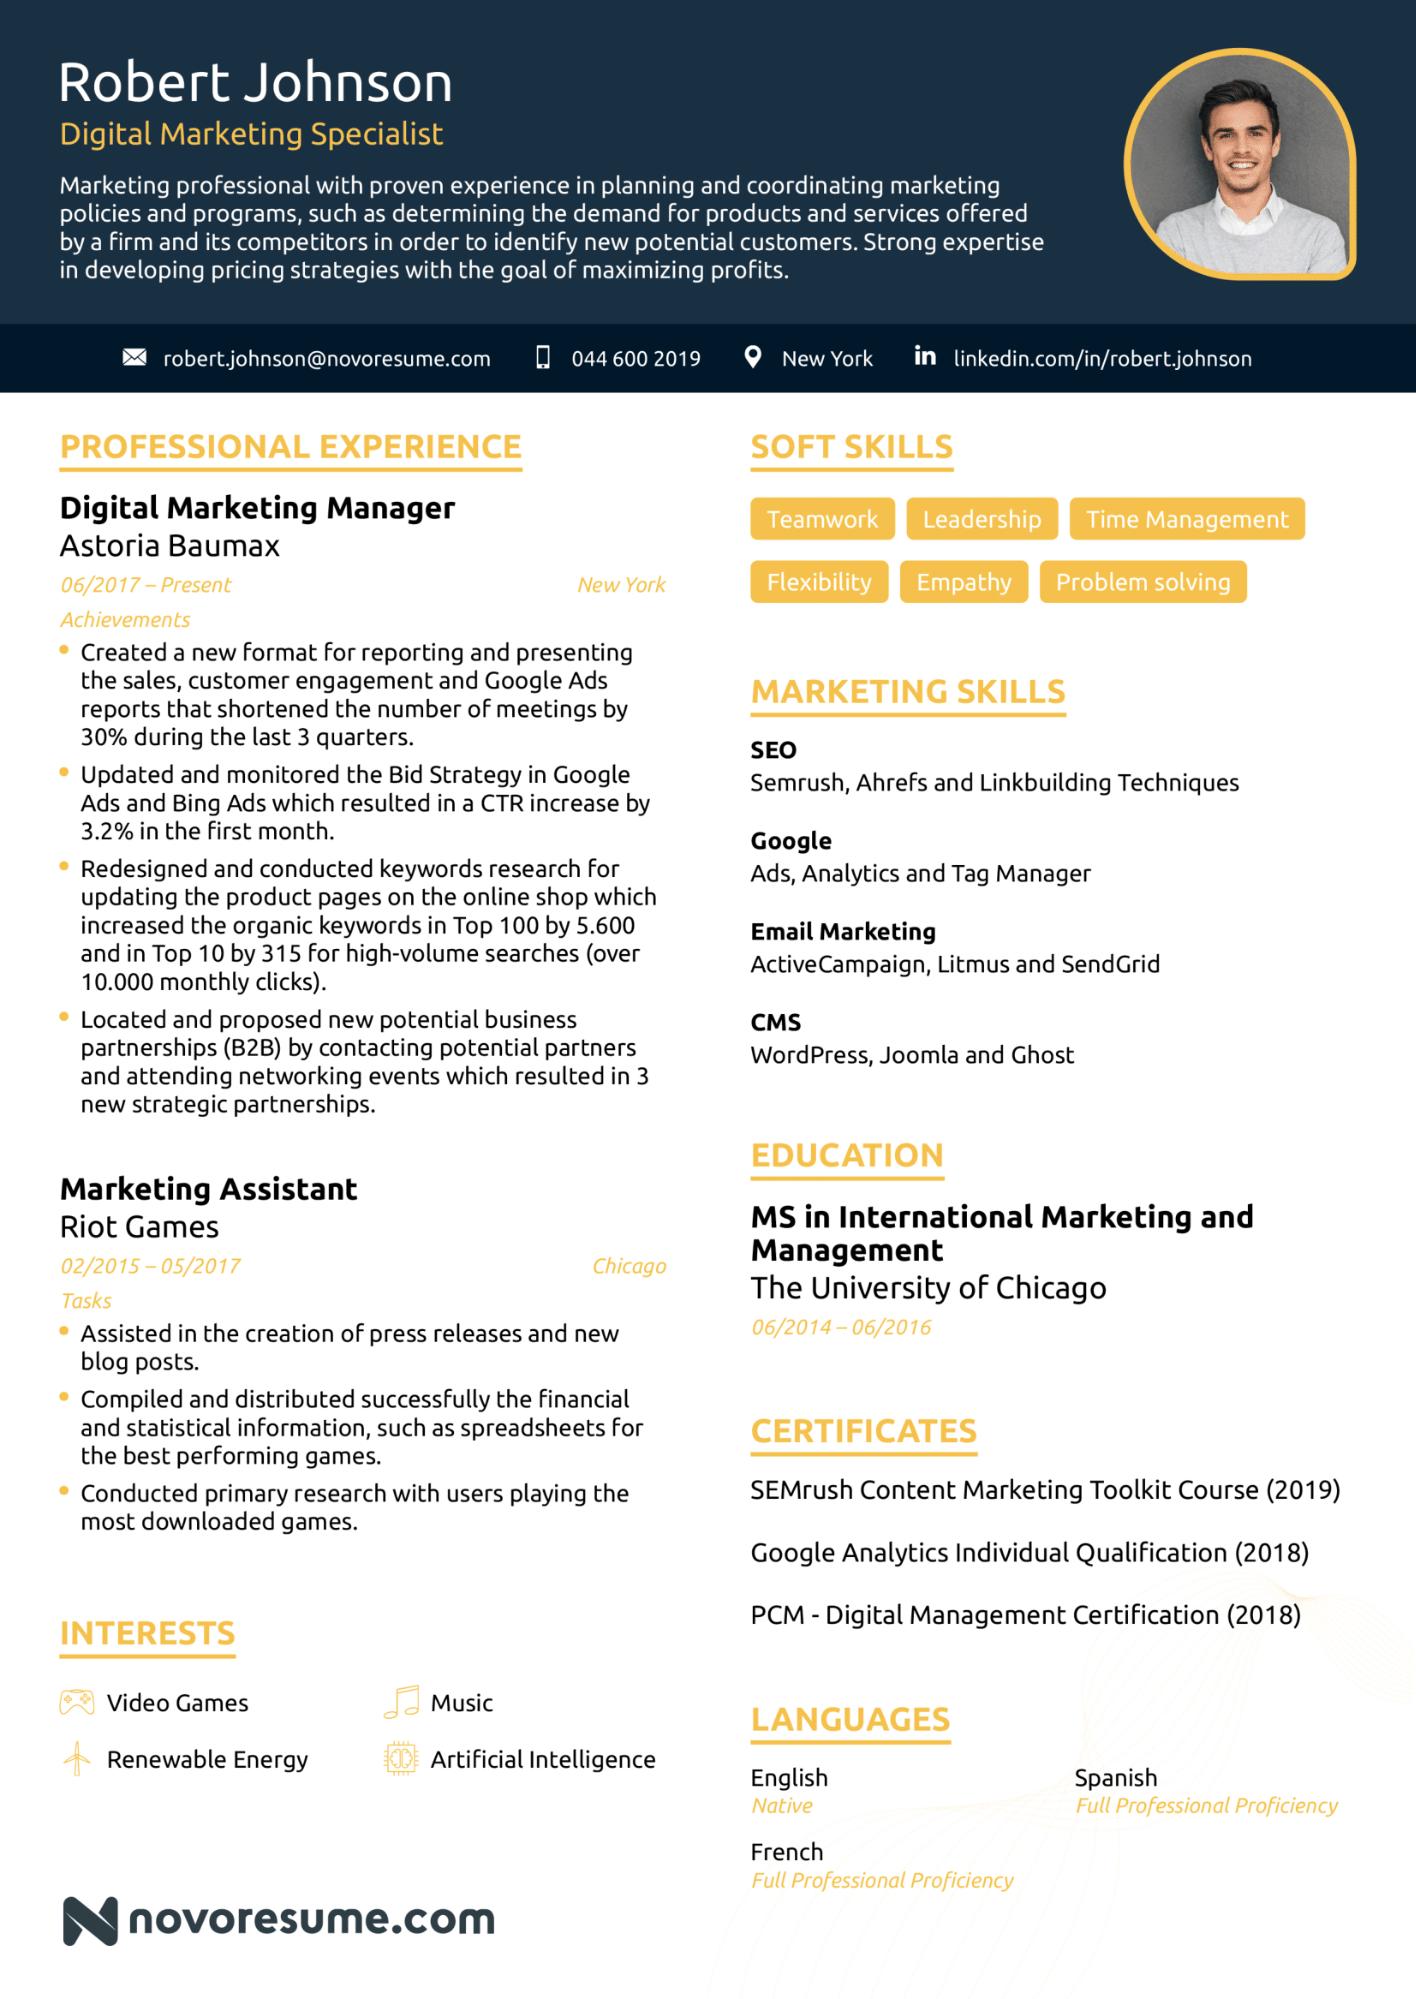 Executive Resume Templates 2020 in 2020 Marketing resume